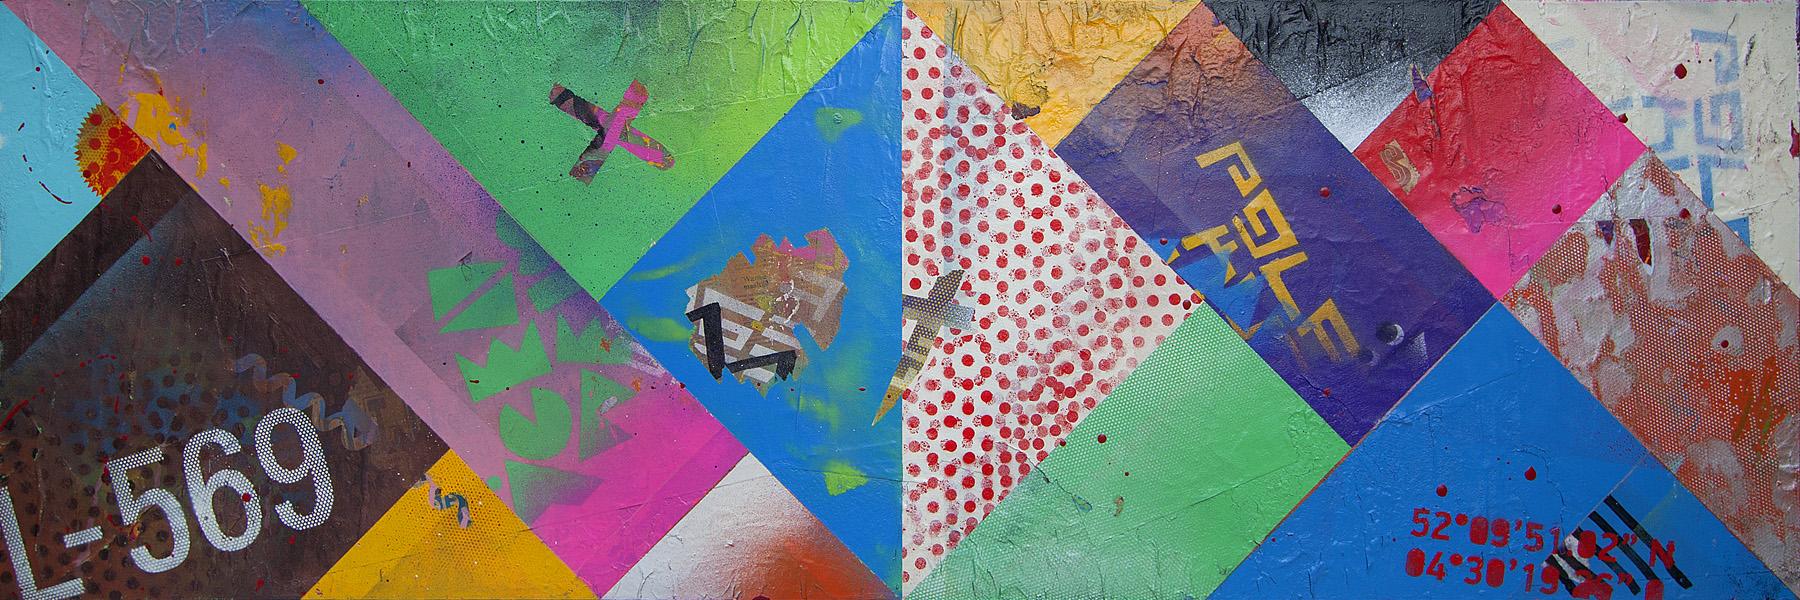 bart-knegt-art-layers-04.jpg